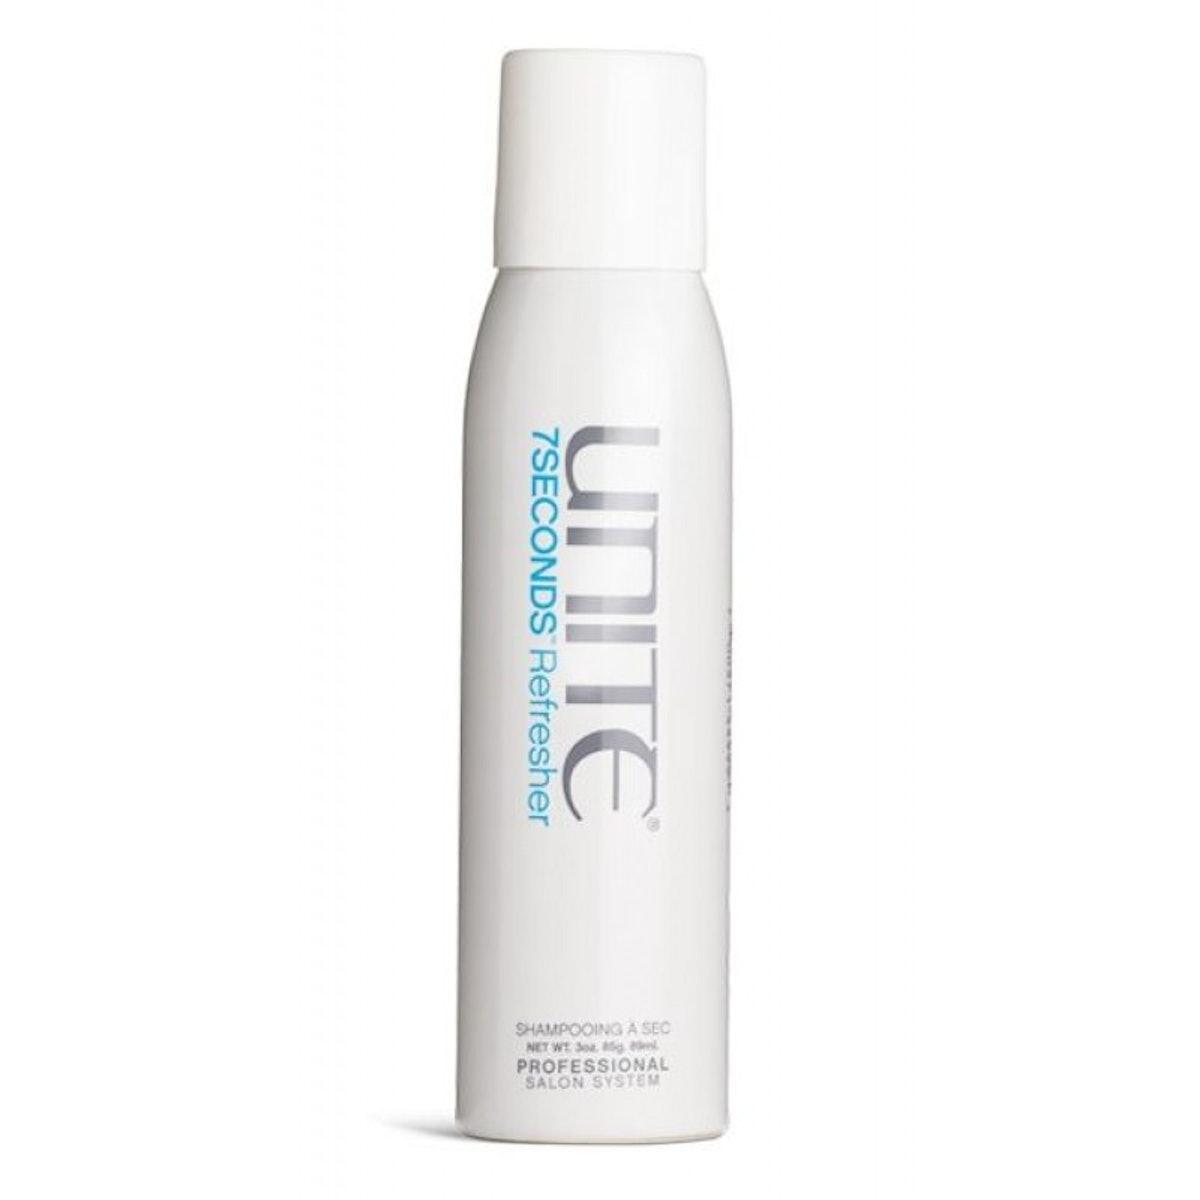 7SECONDS Refresher Dry Shampoo